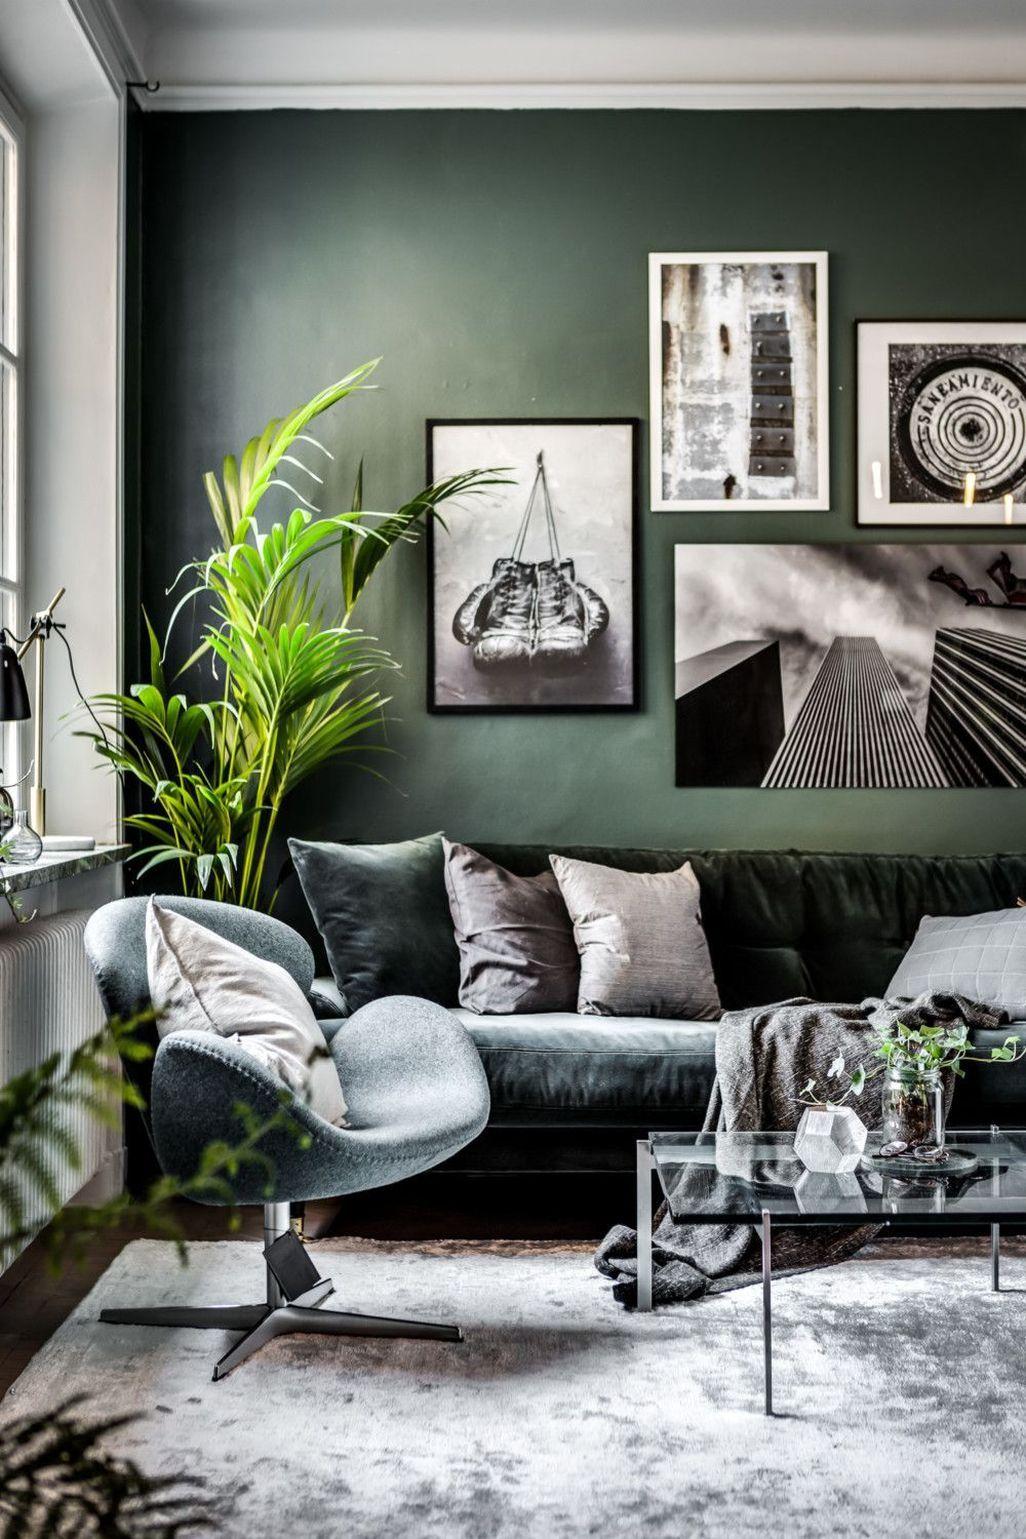 Interior interiordesign interiorinspo interiorideas inredning inredningstips inredningsideer inredningsinspo inredningsinsp  also rh pinterest